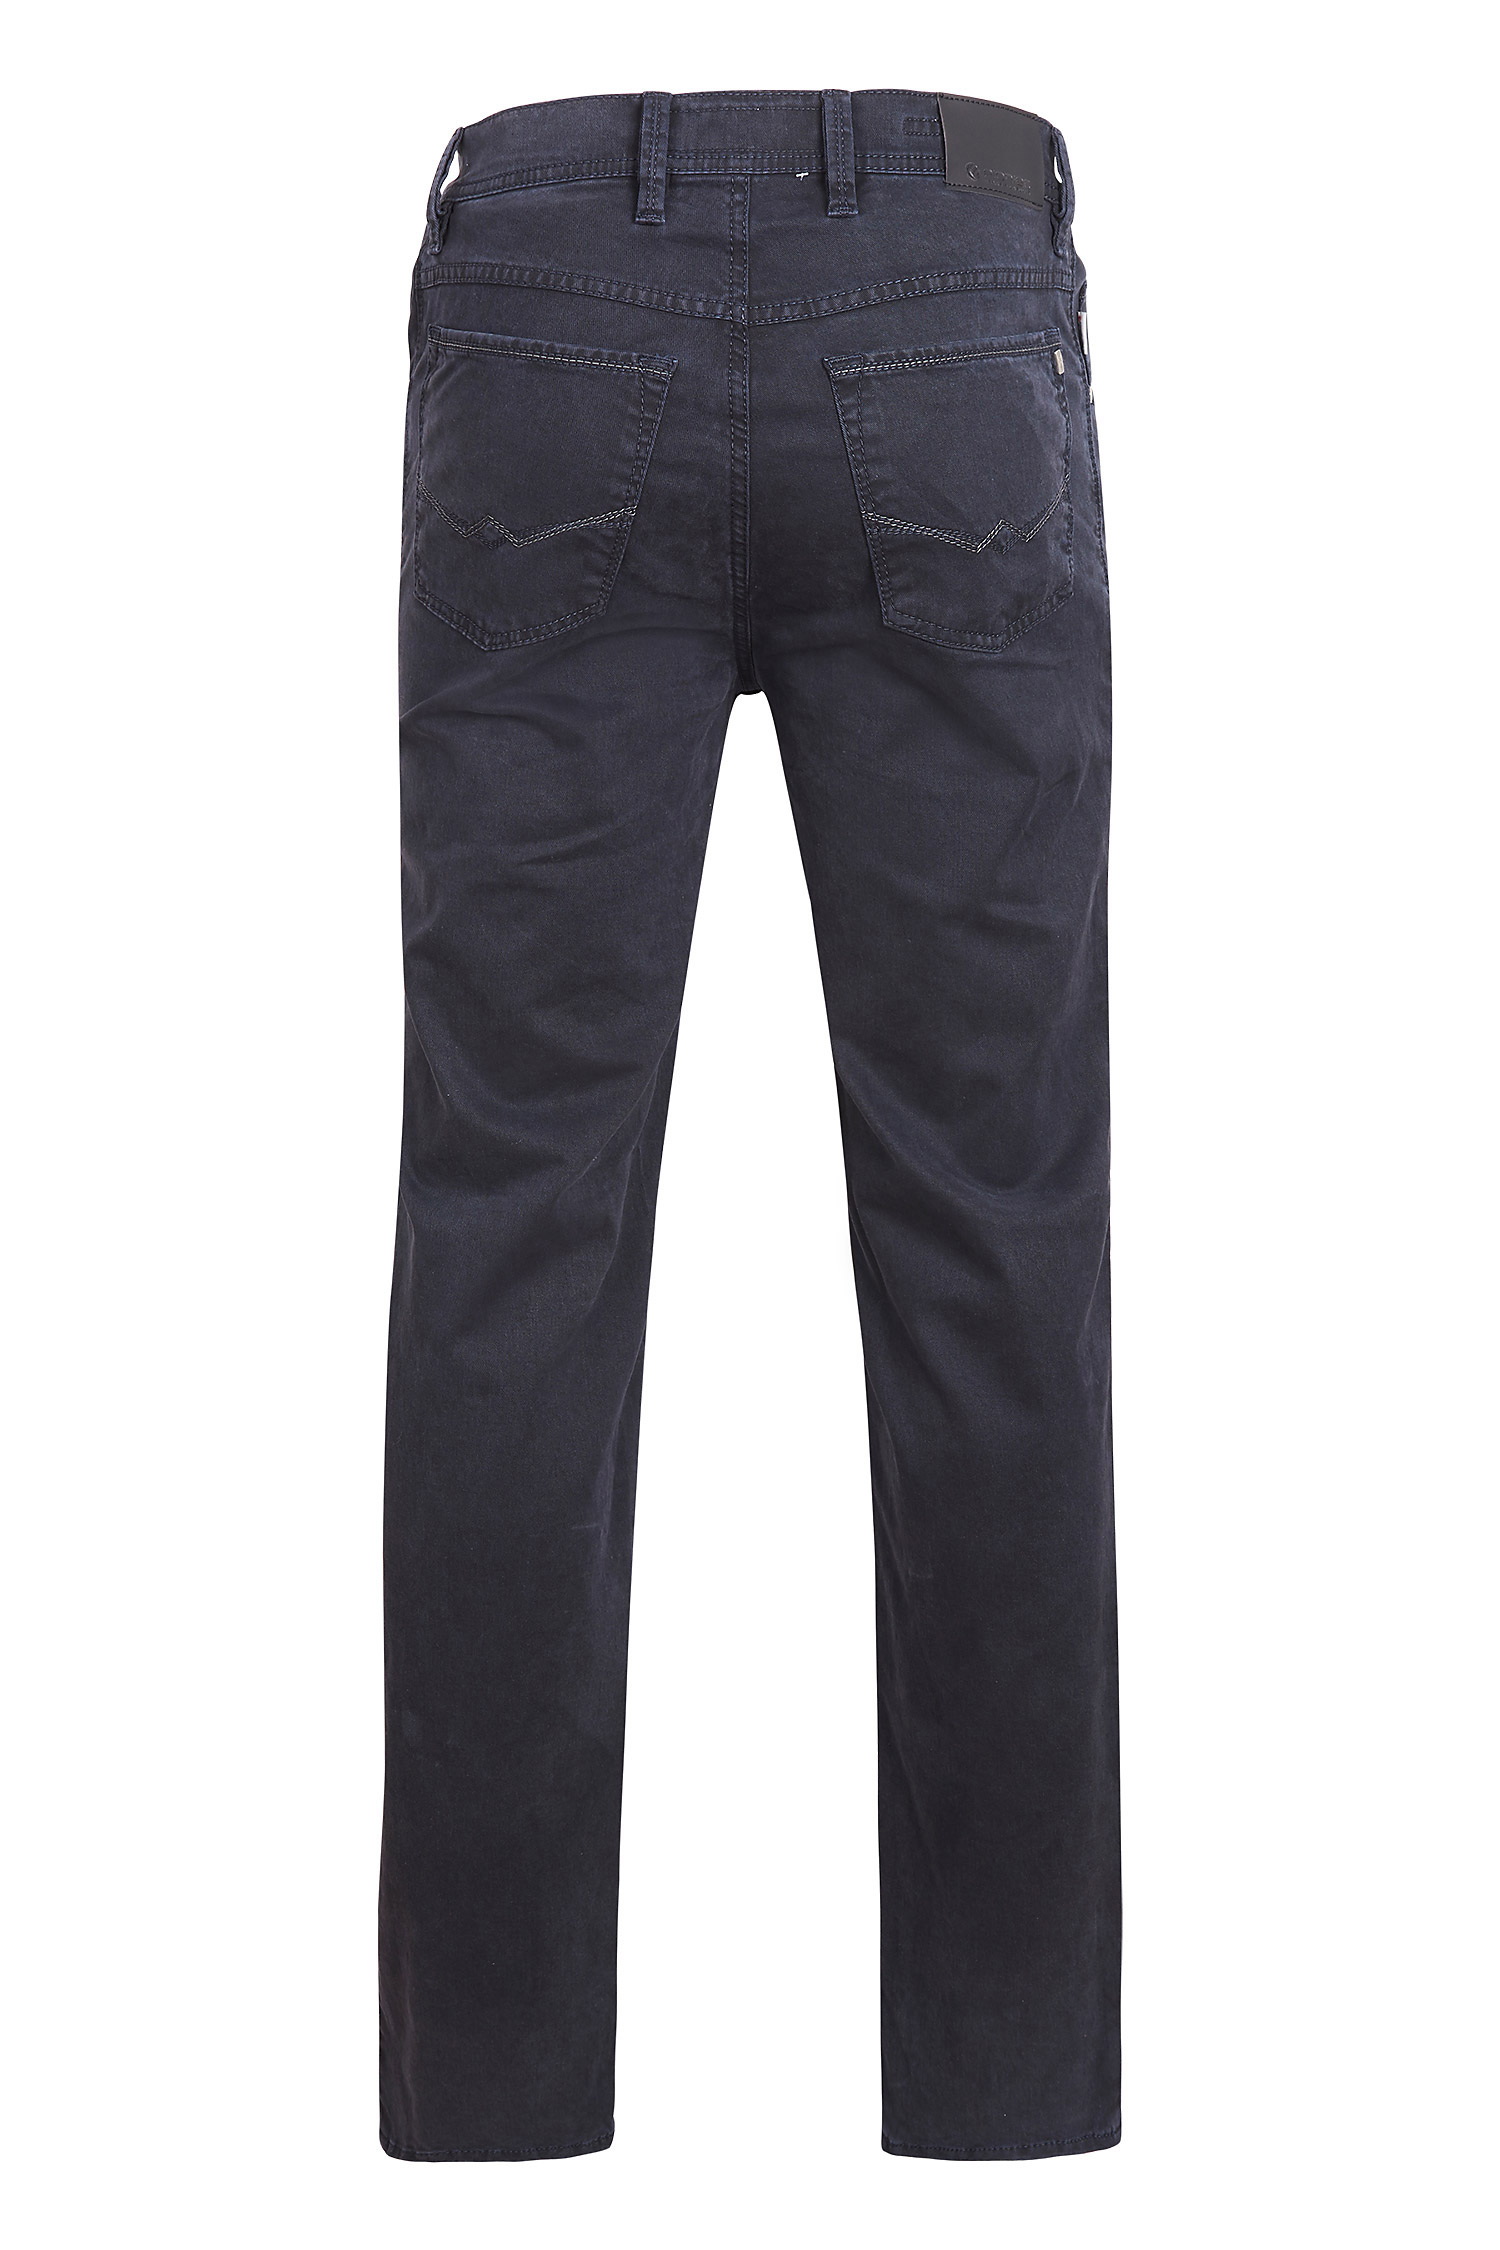 Pantalones, Sport, 107947, NEGRO   Zoom